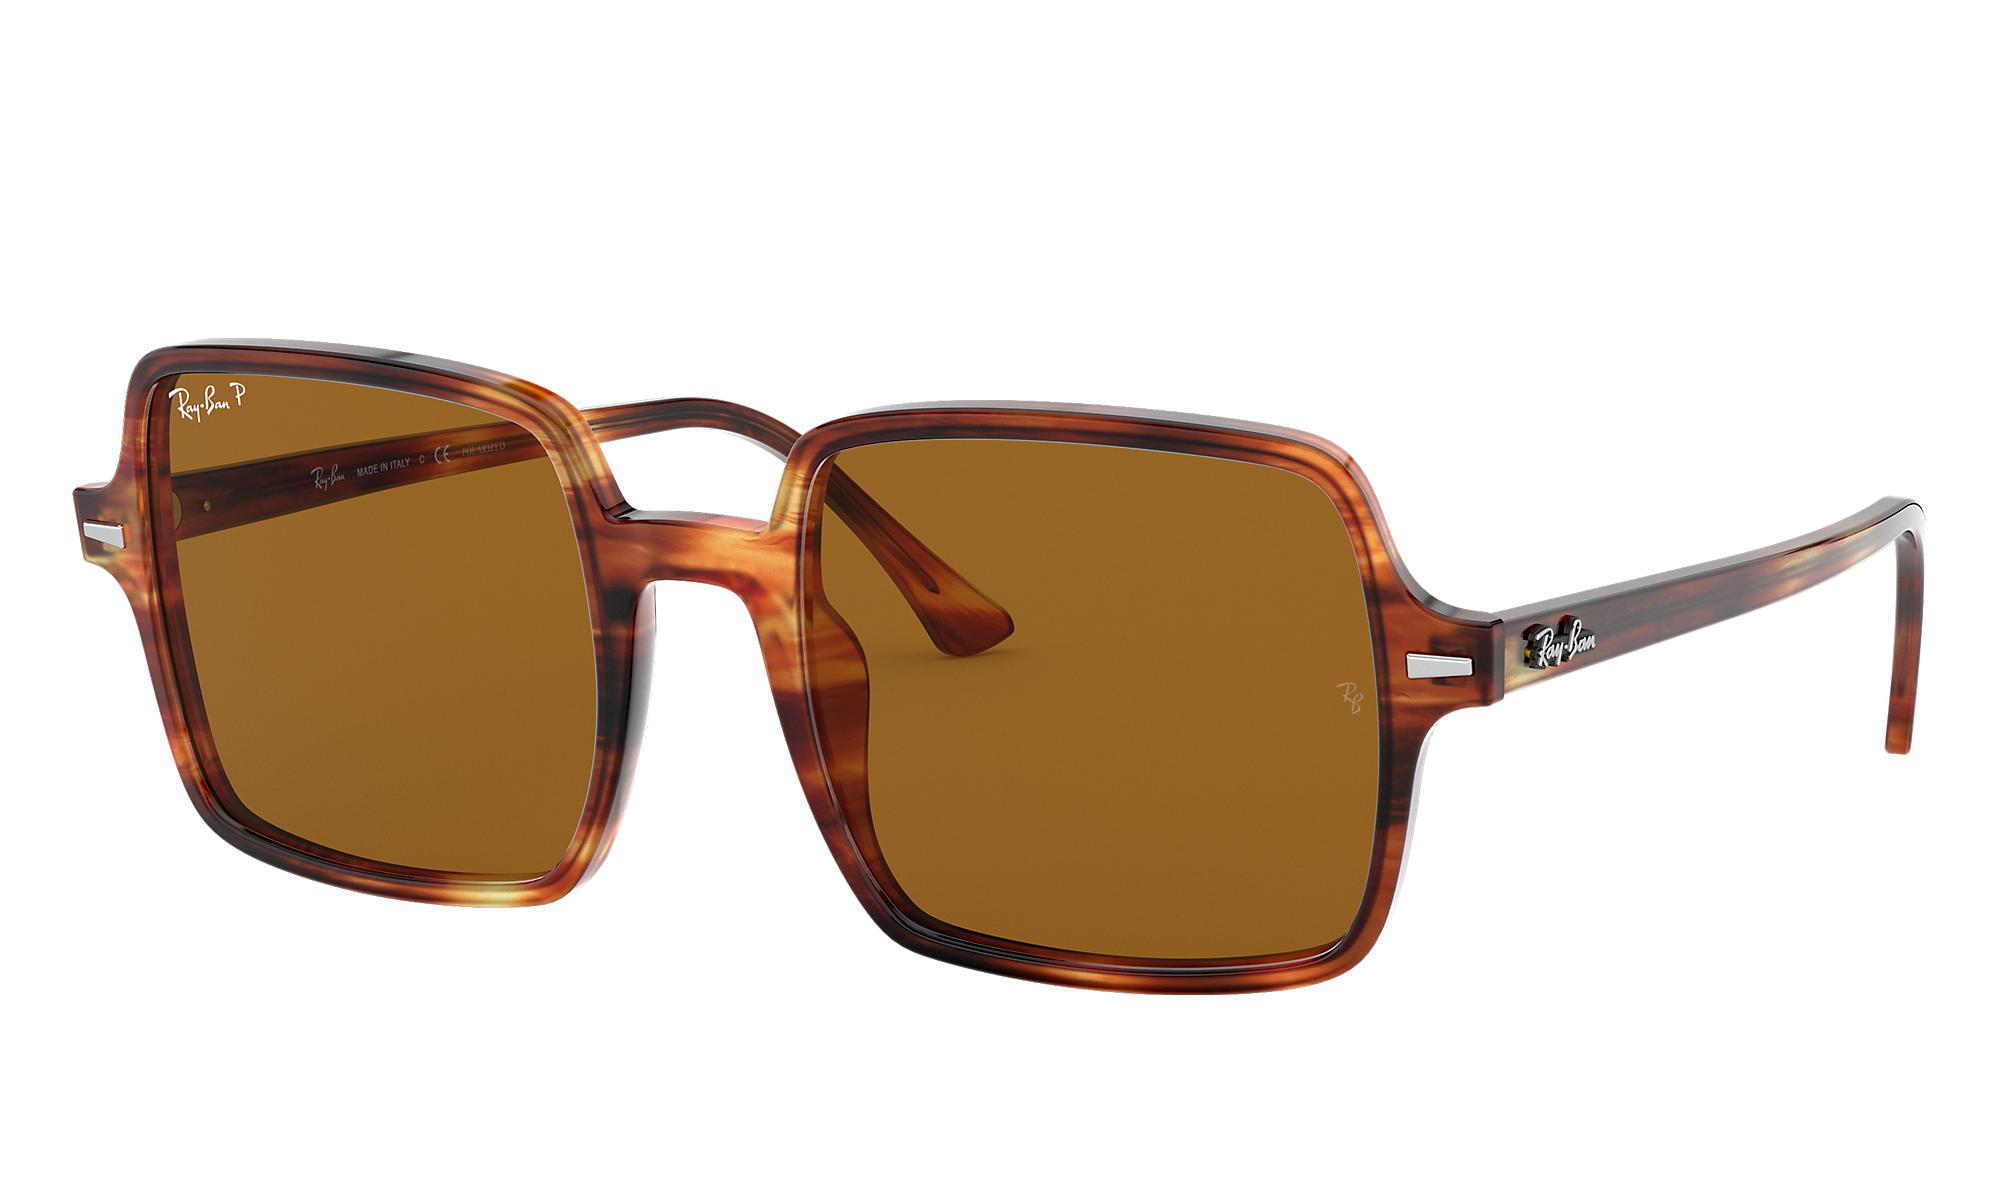 Ray-Ban SQUARE II | Glasses.com® | Free Shipping